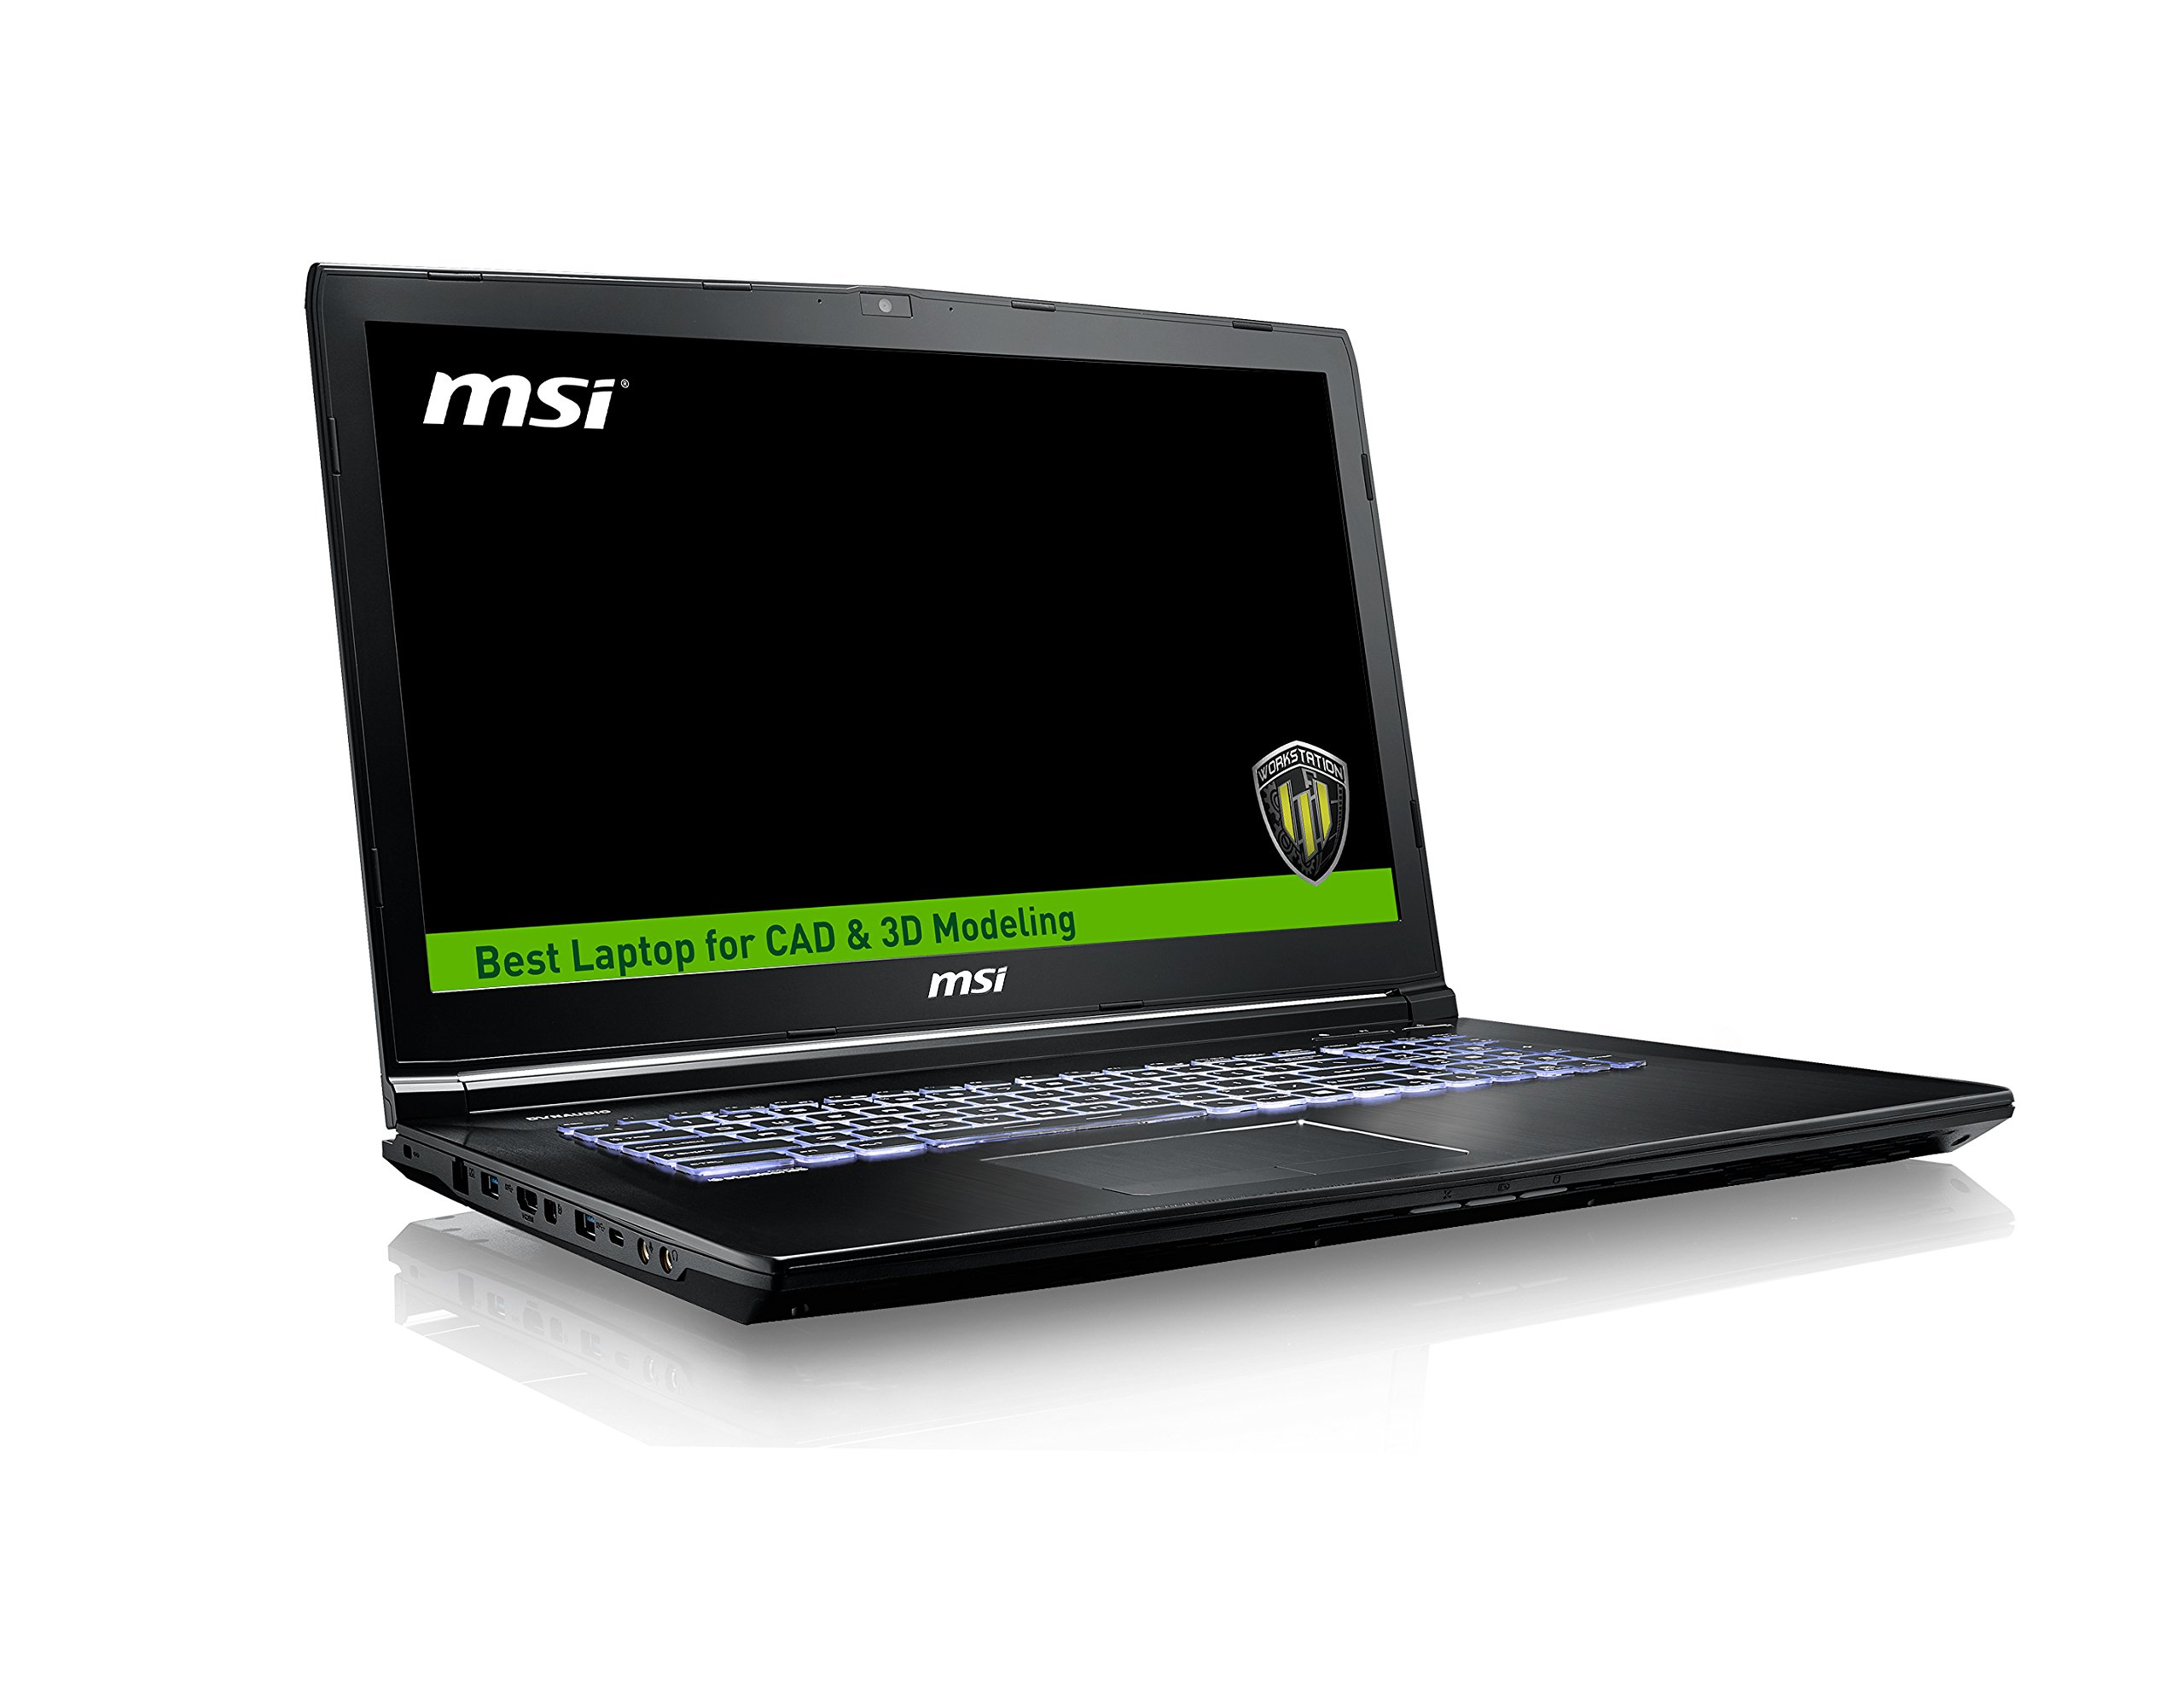 "MSI WE72 7RJ-1032US 17.3"" Professional Workstation Laptop Core i7-7700HQ Quadro M2200 32GB 512GB SSD, Aluminum Black"